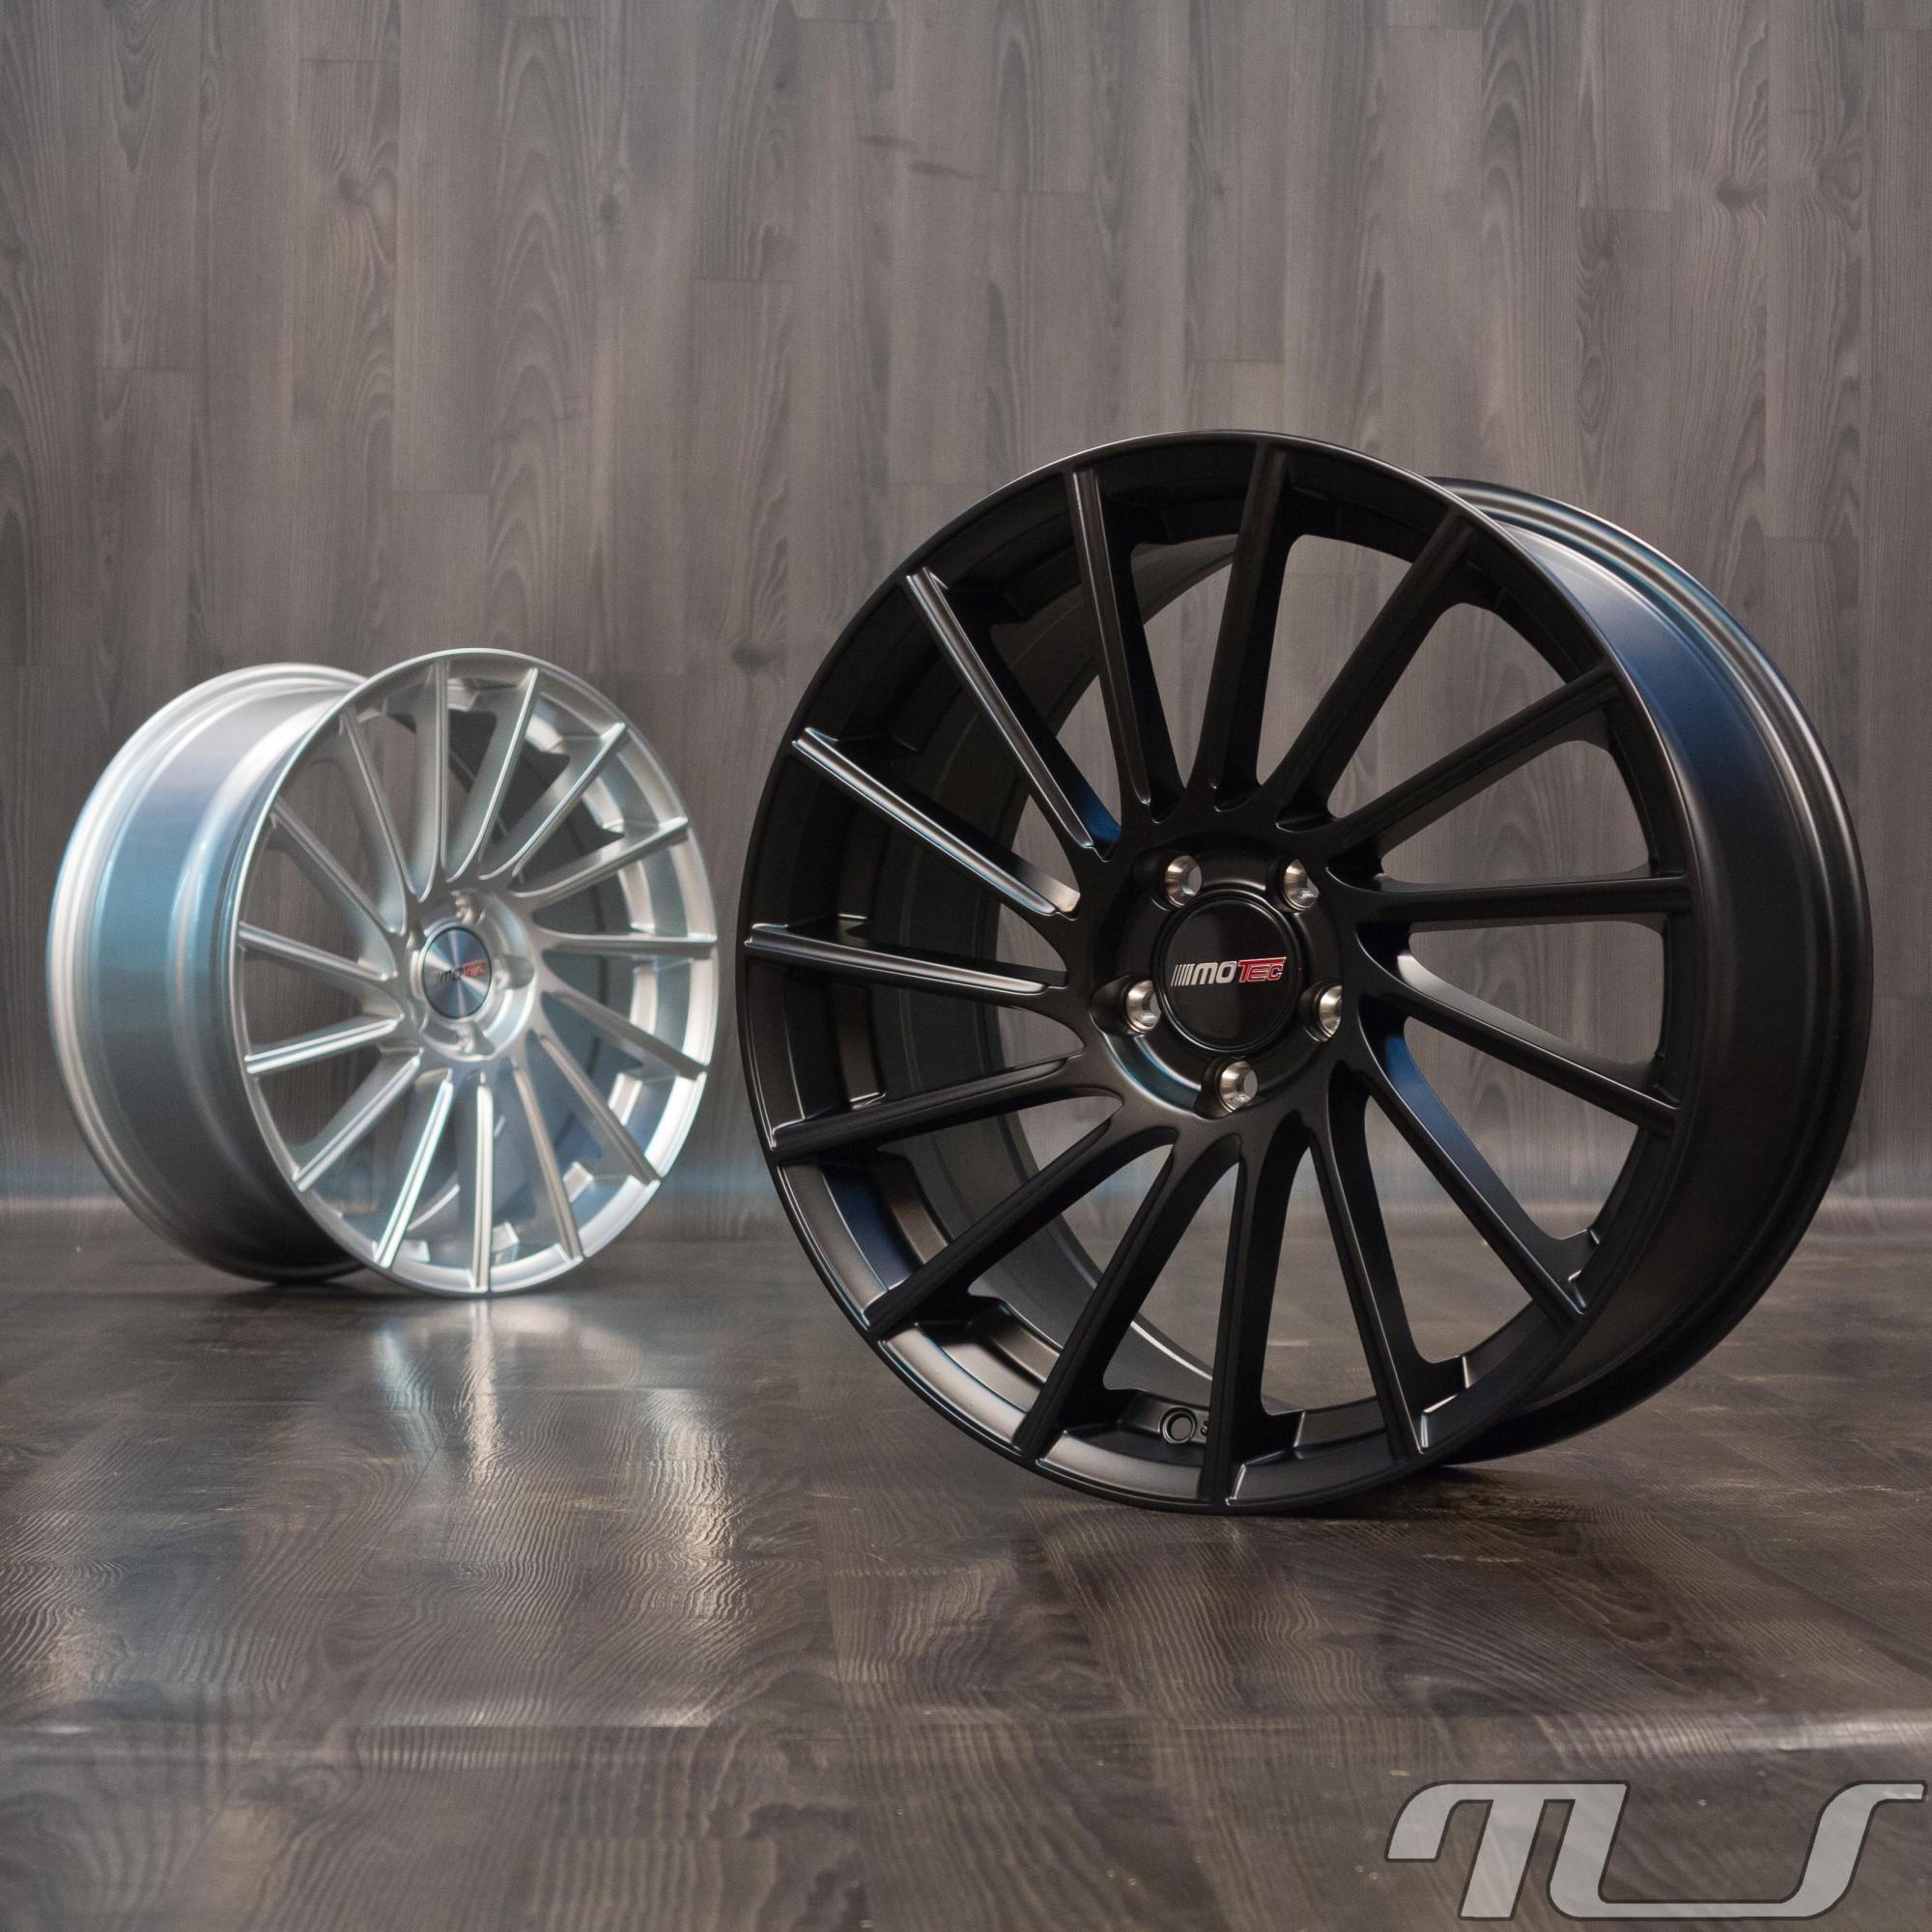 19 Inch Alloy Wheels For Bmw Series 3 E90 F30 Gt 4 5 E60